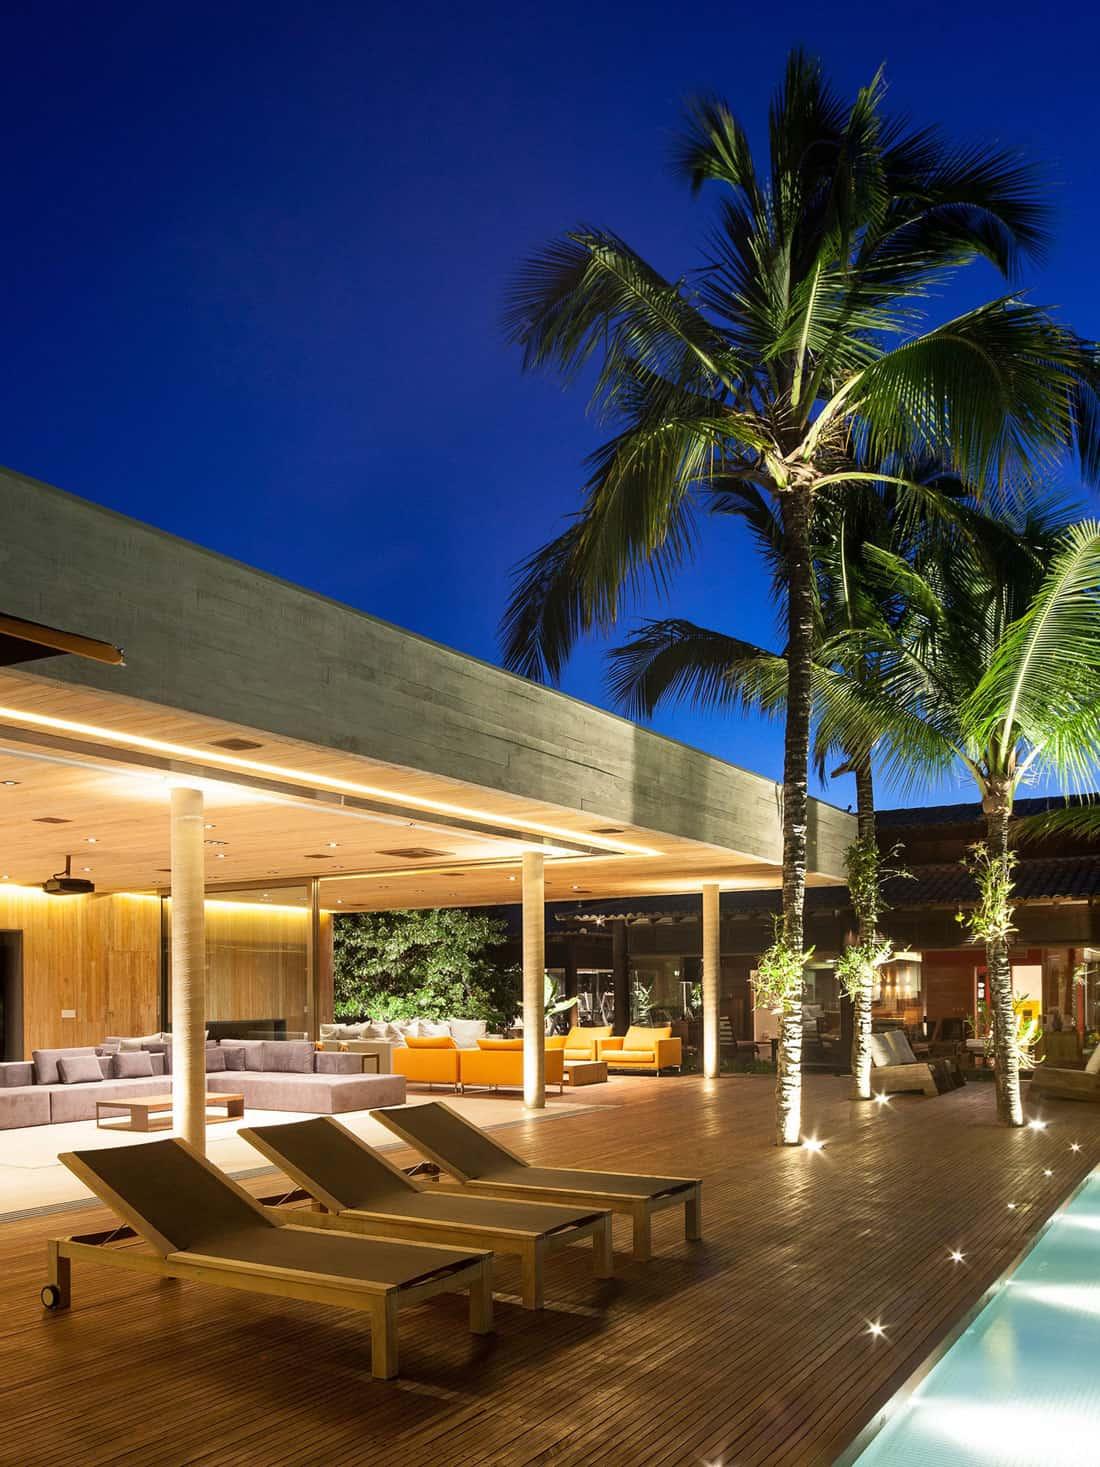 Residencia MZ by Basiches Arquitetos (14)